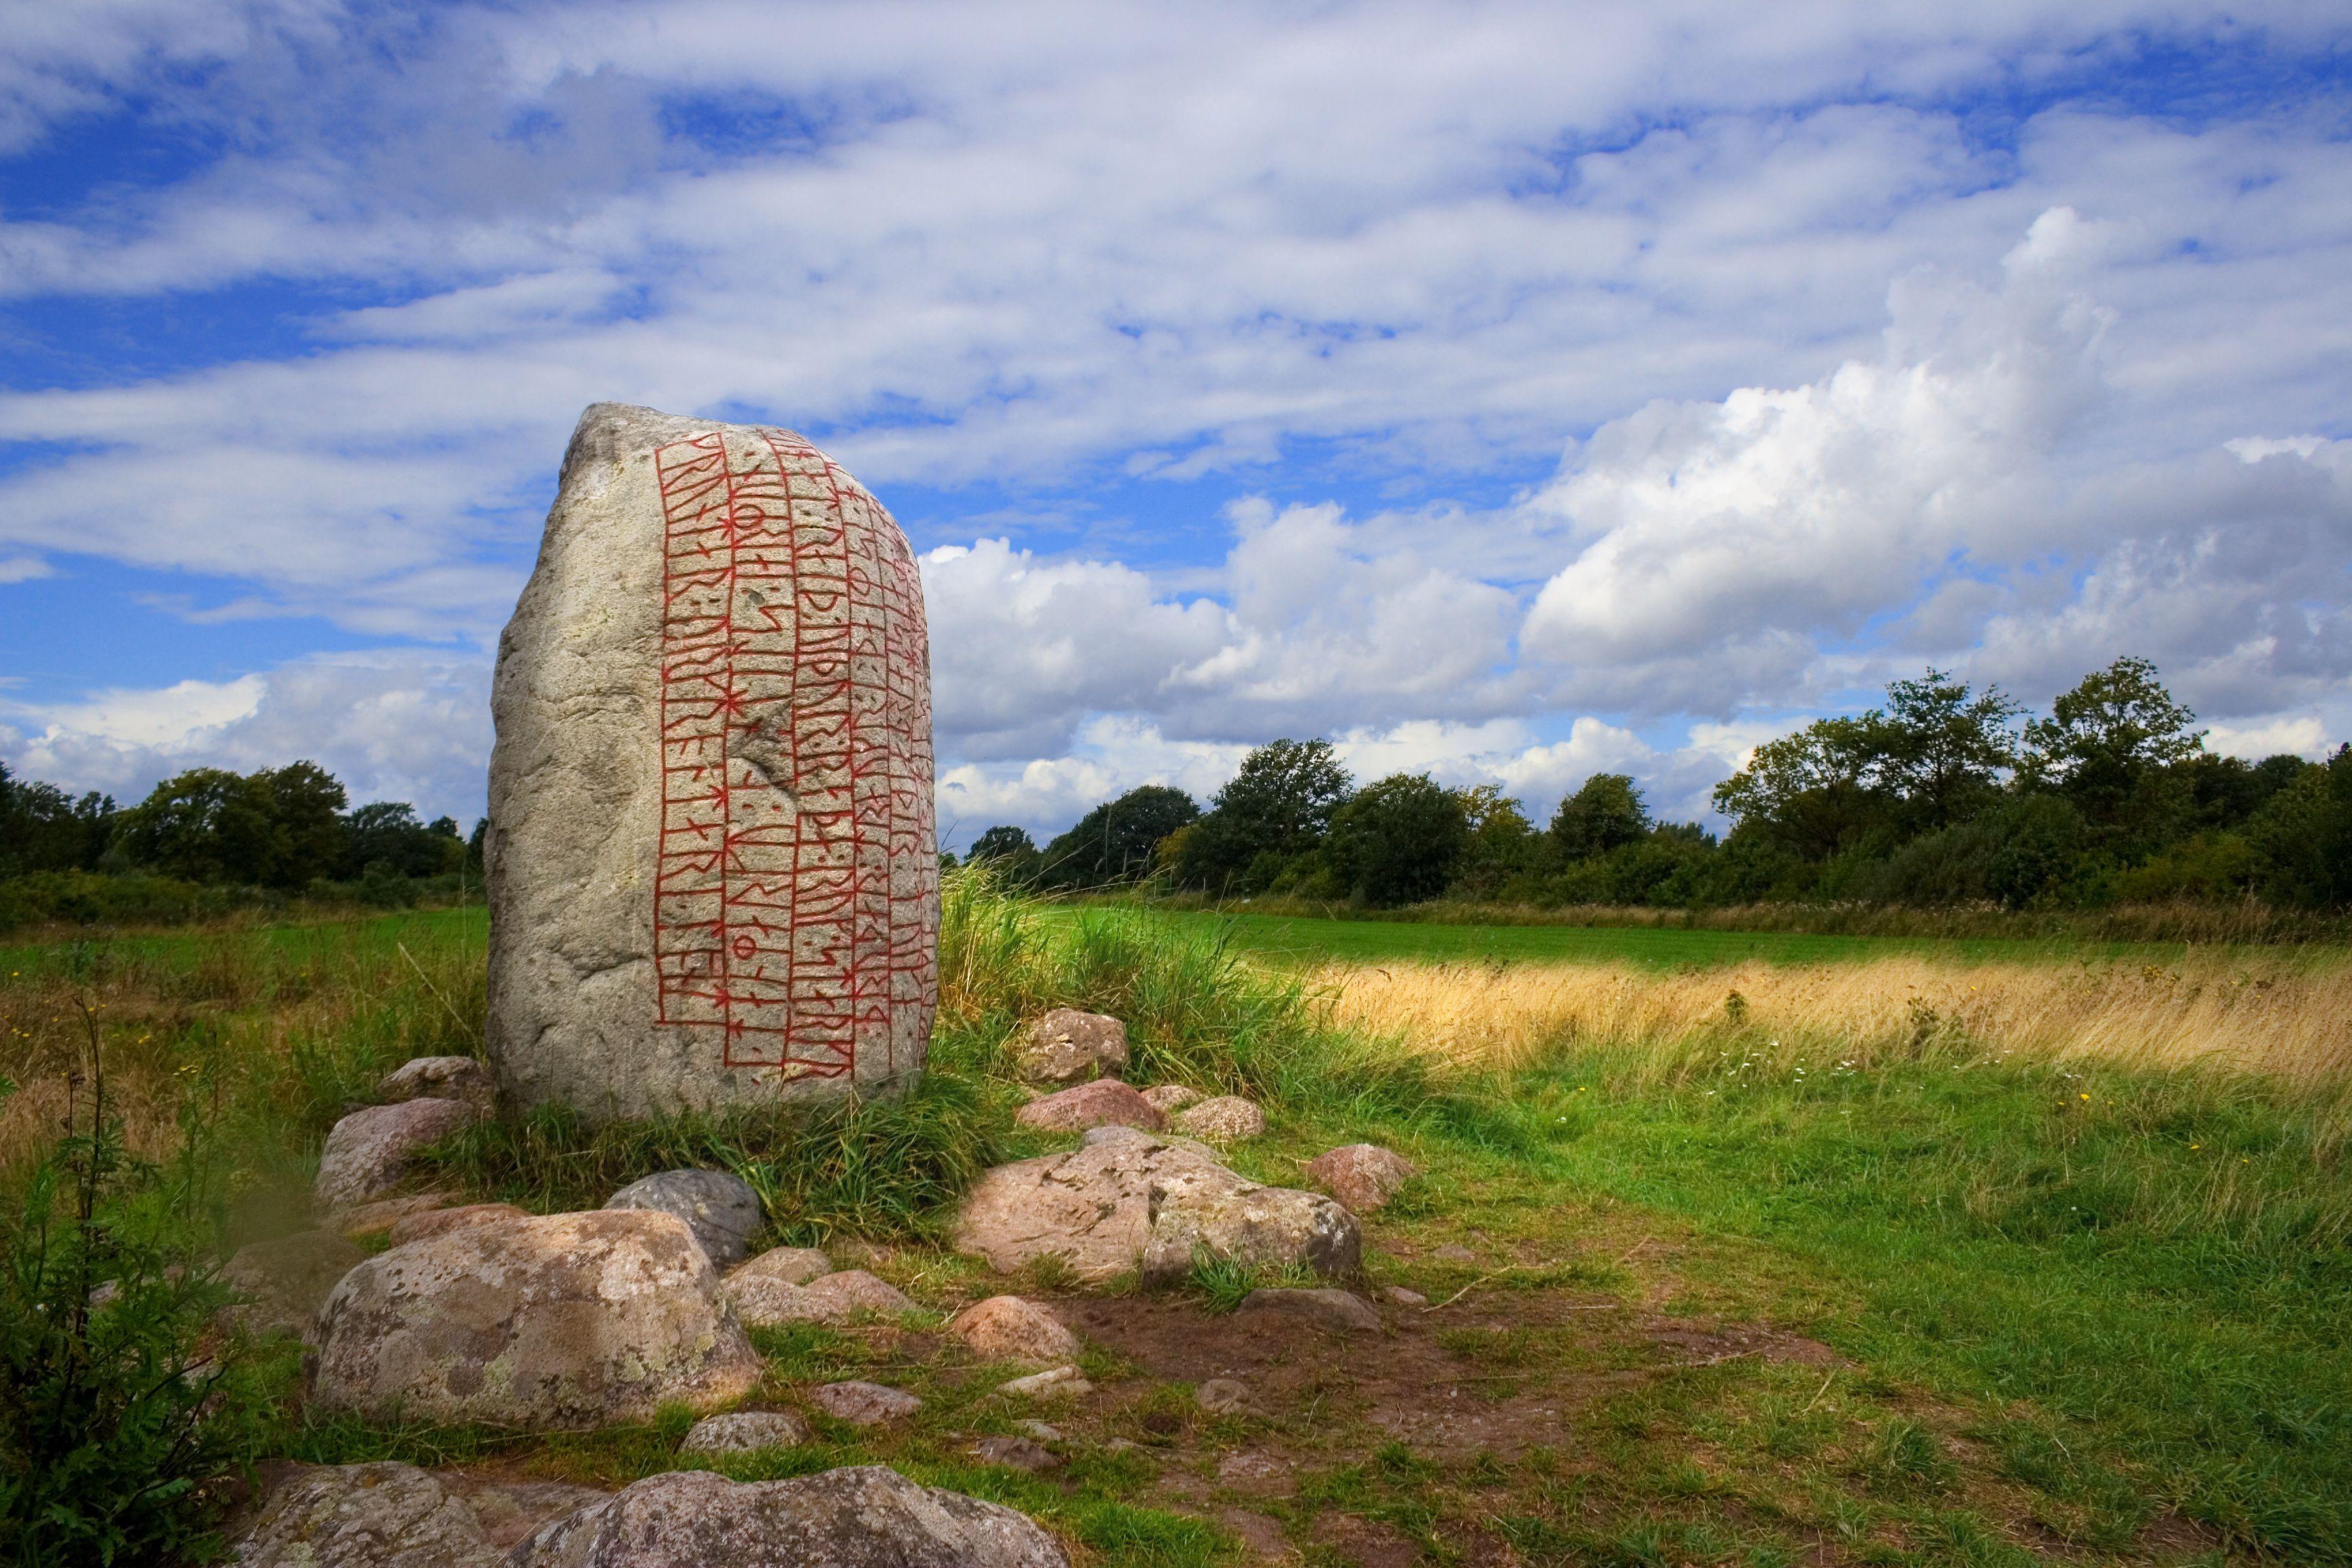 Runestone - Oland, Sweden